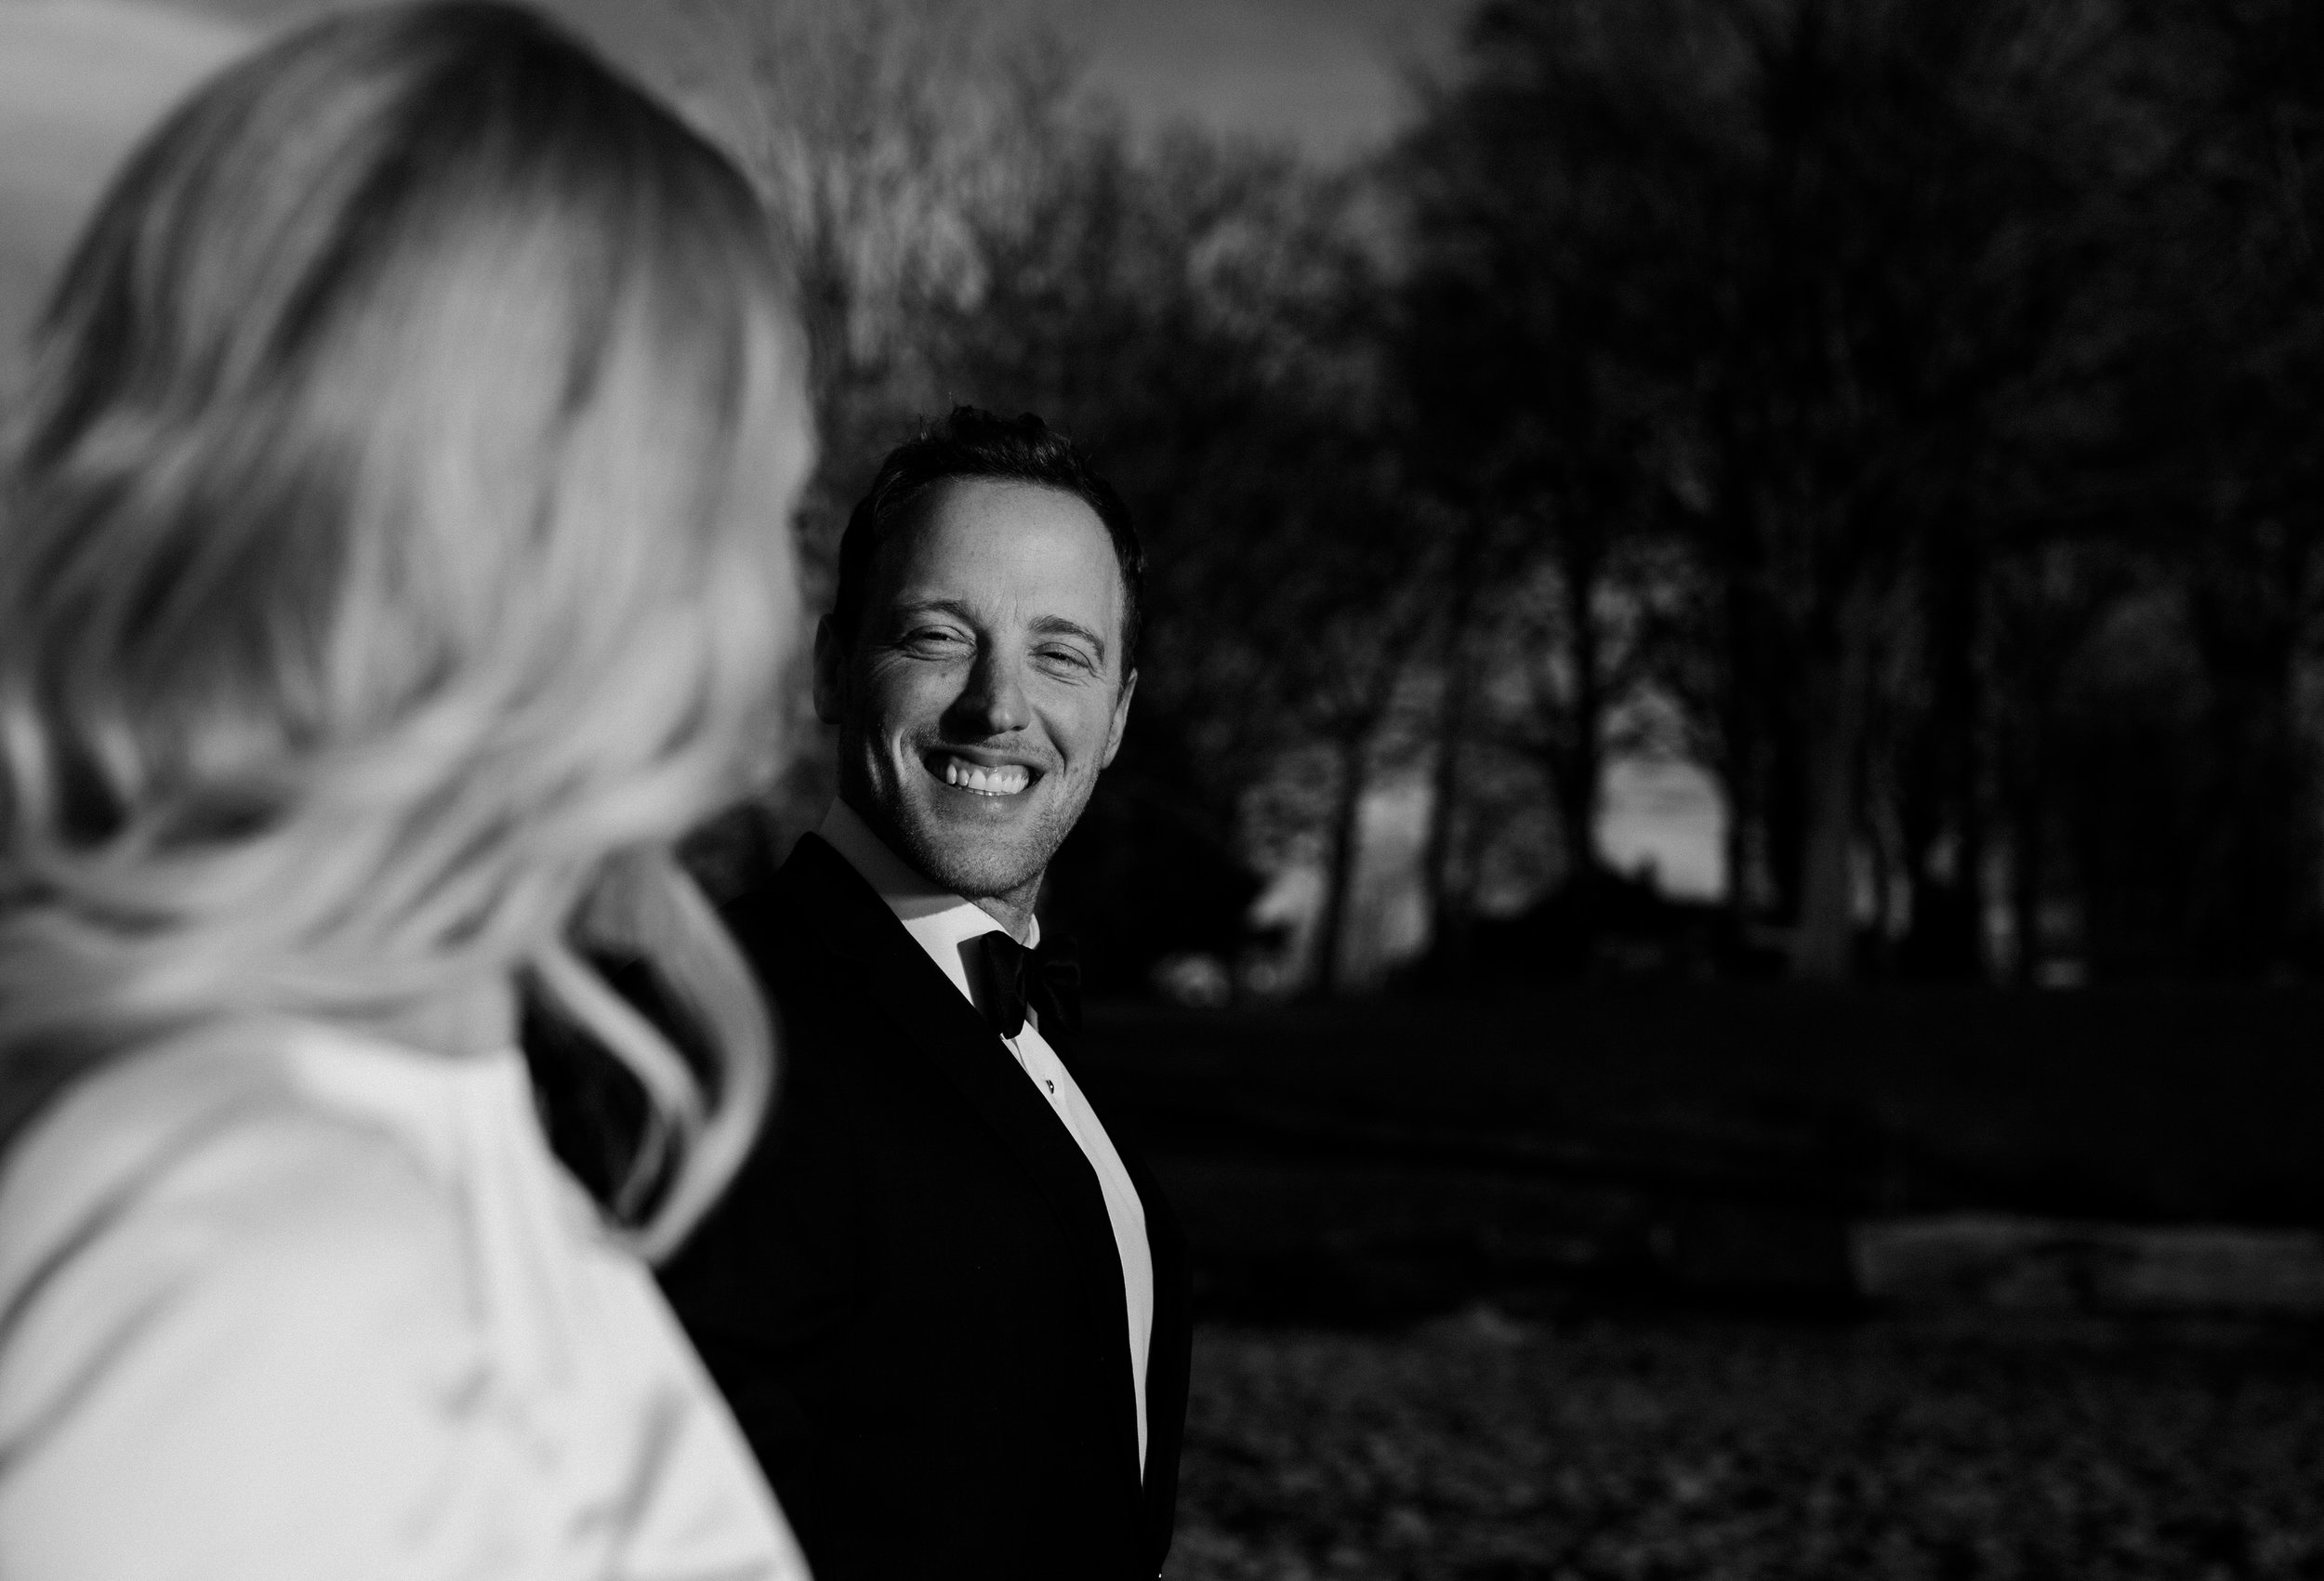 Vancouver Wedding Photos - Vegan Wedding Photographer - New Years Eve Wedding Photos - Vancouver Wedding Photographer - Vancouver Wedding Videographer - 667.JPG